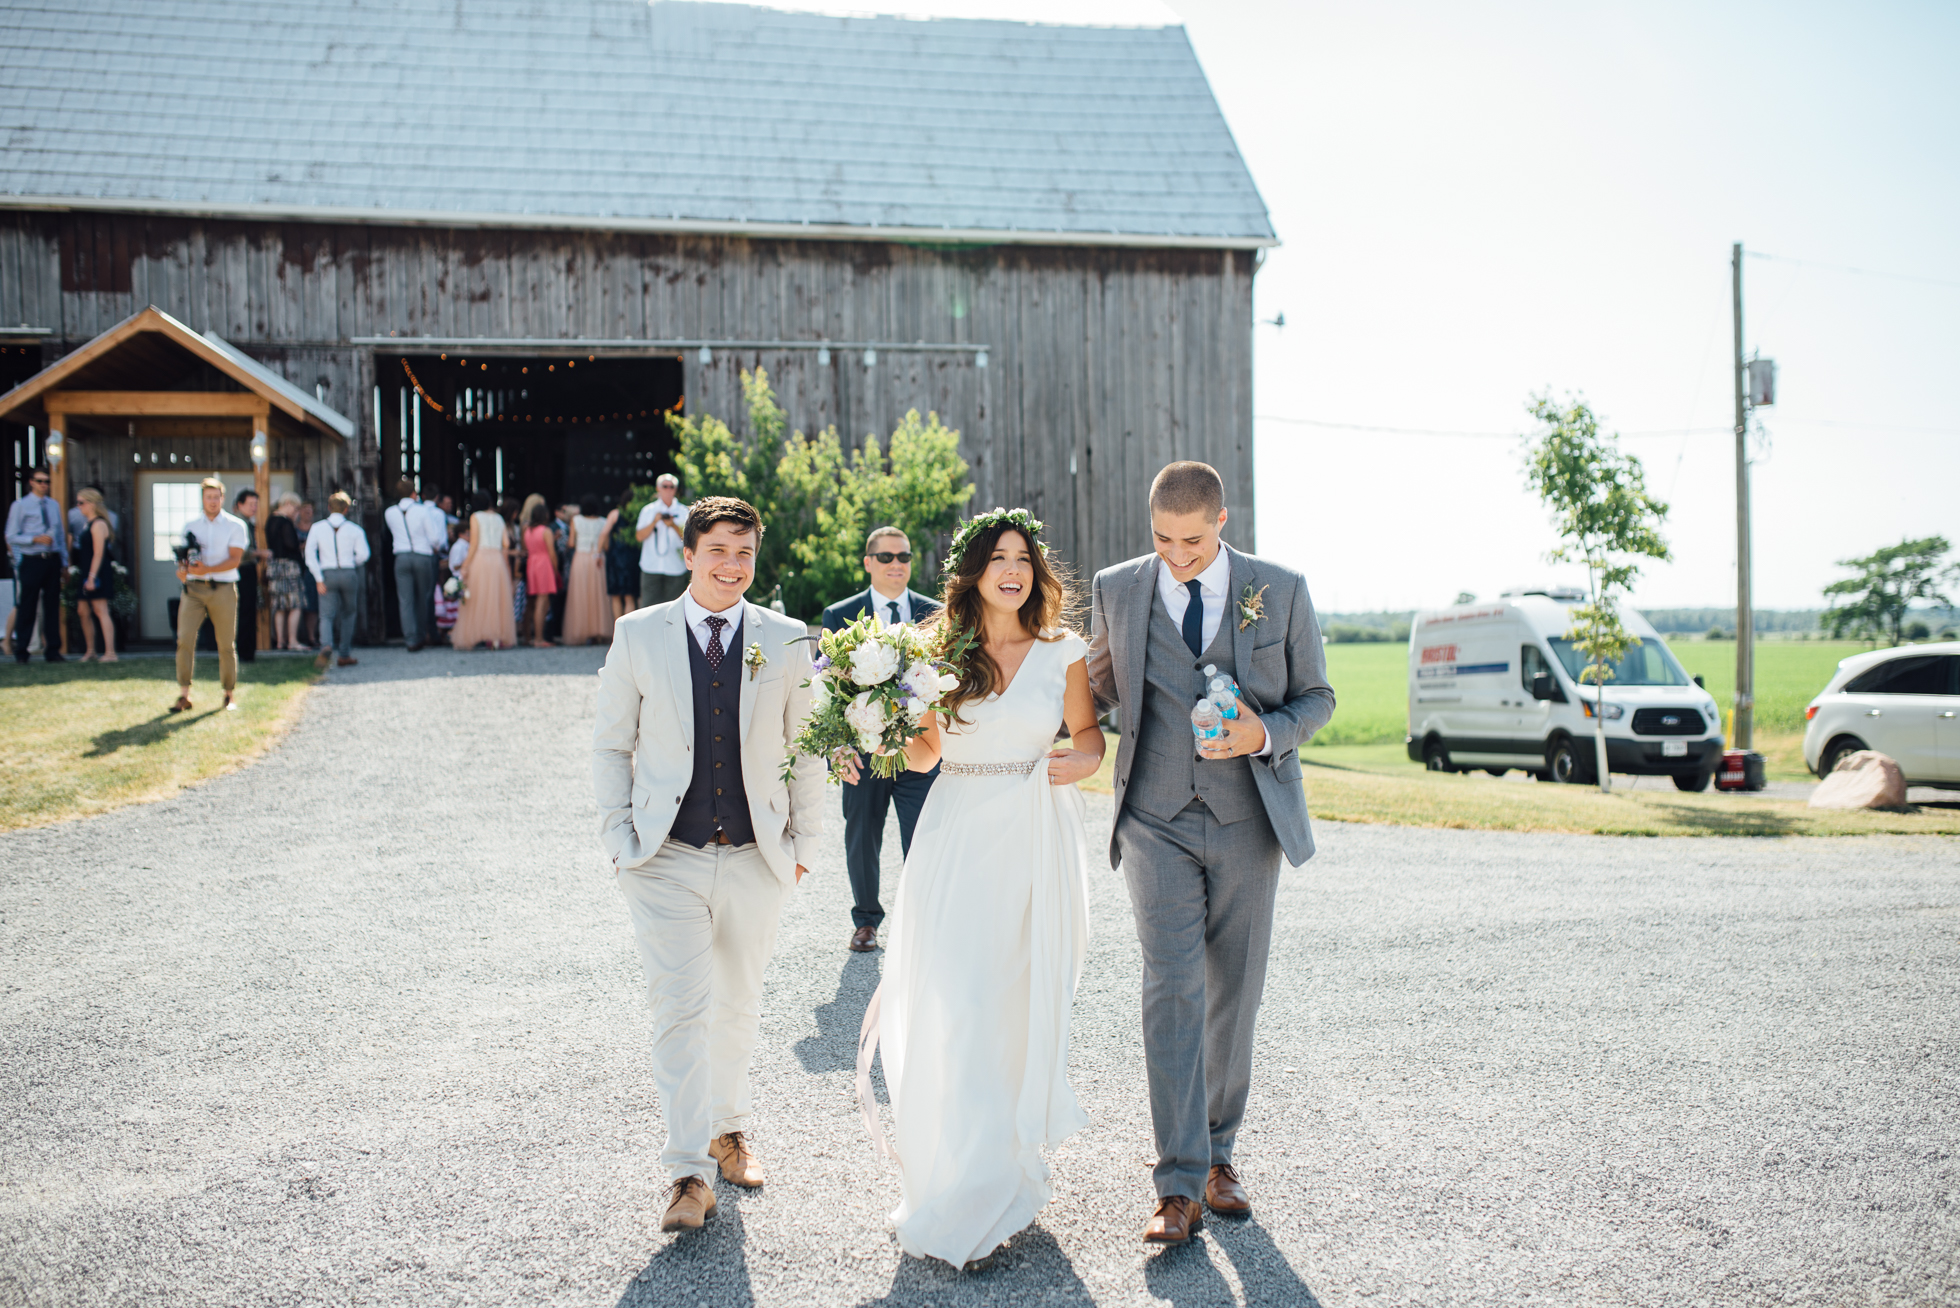 Downswell-Barn-Wedding-Photography-53.jpg